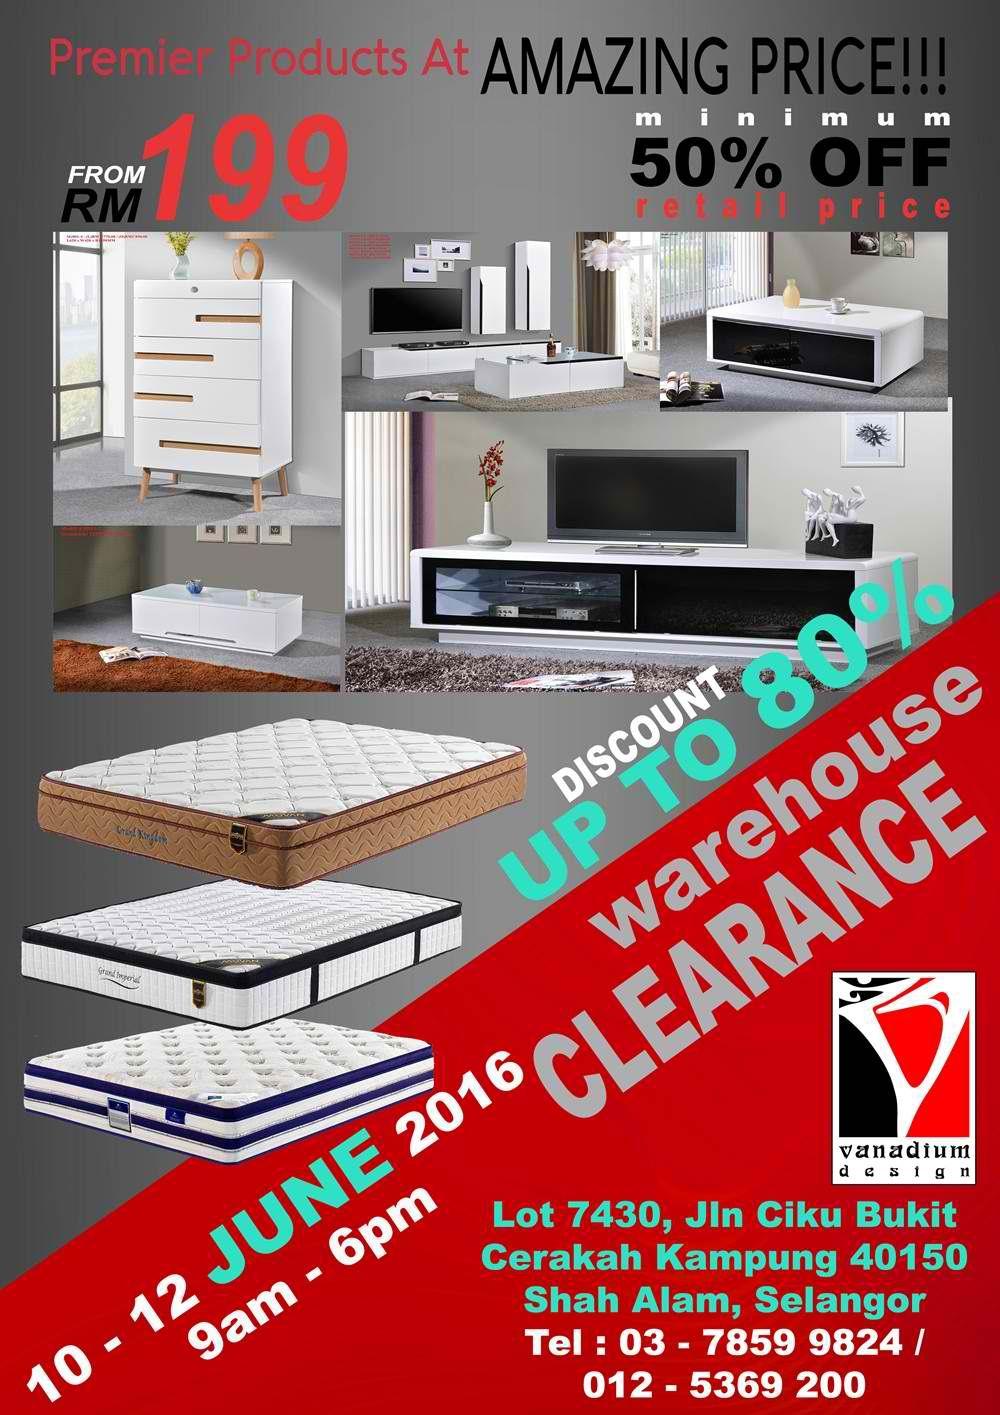 ccf97fbd3666 10-12 Jun 2016  Vanadium Design Warehouse Sale